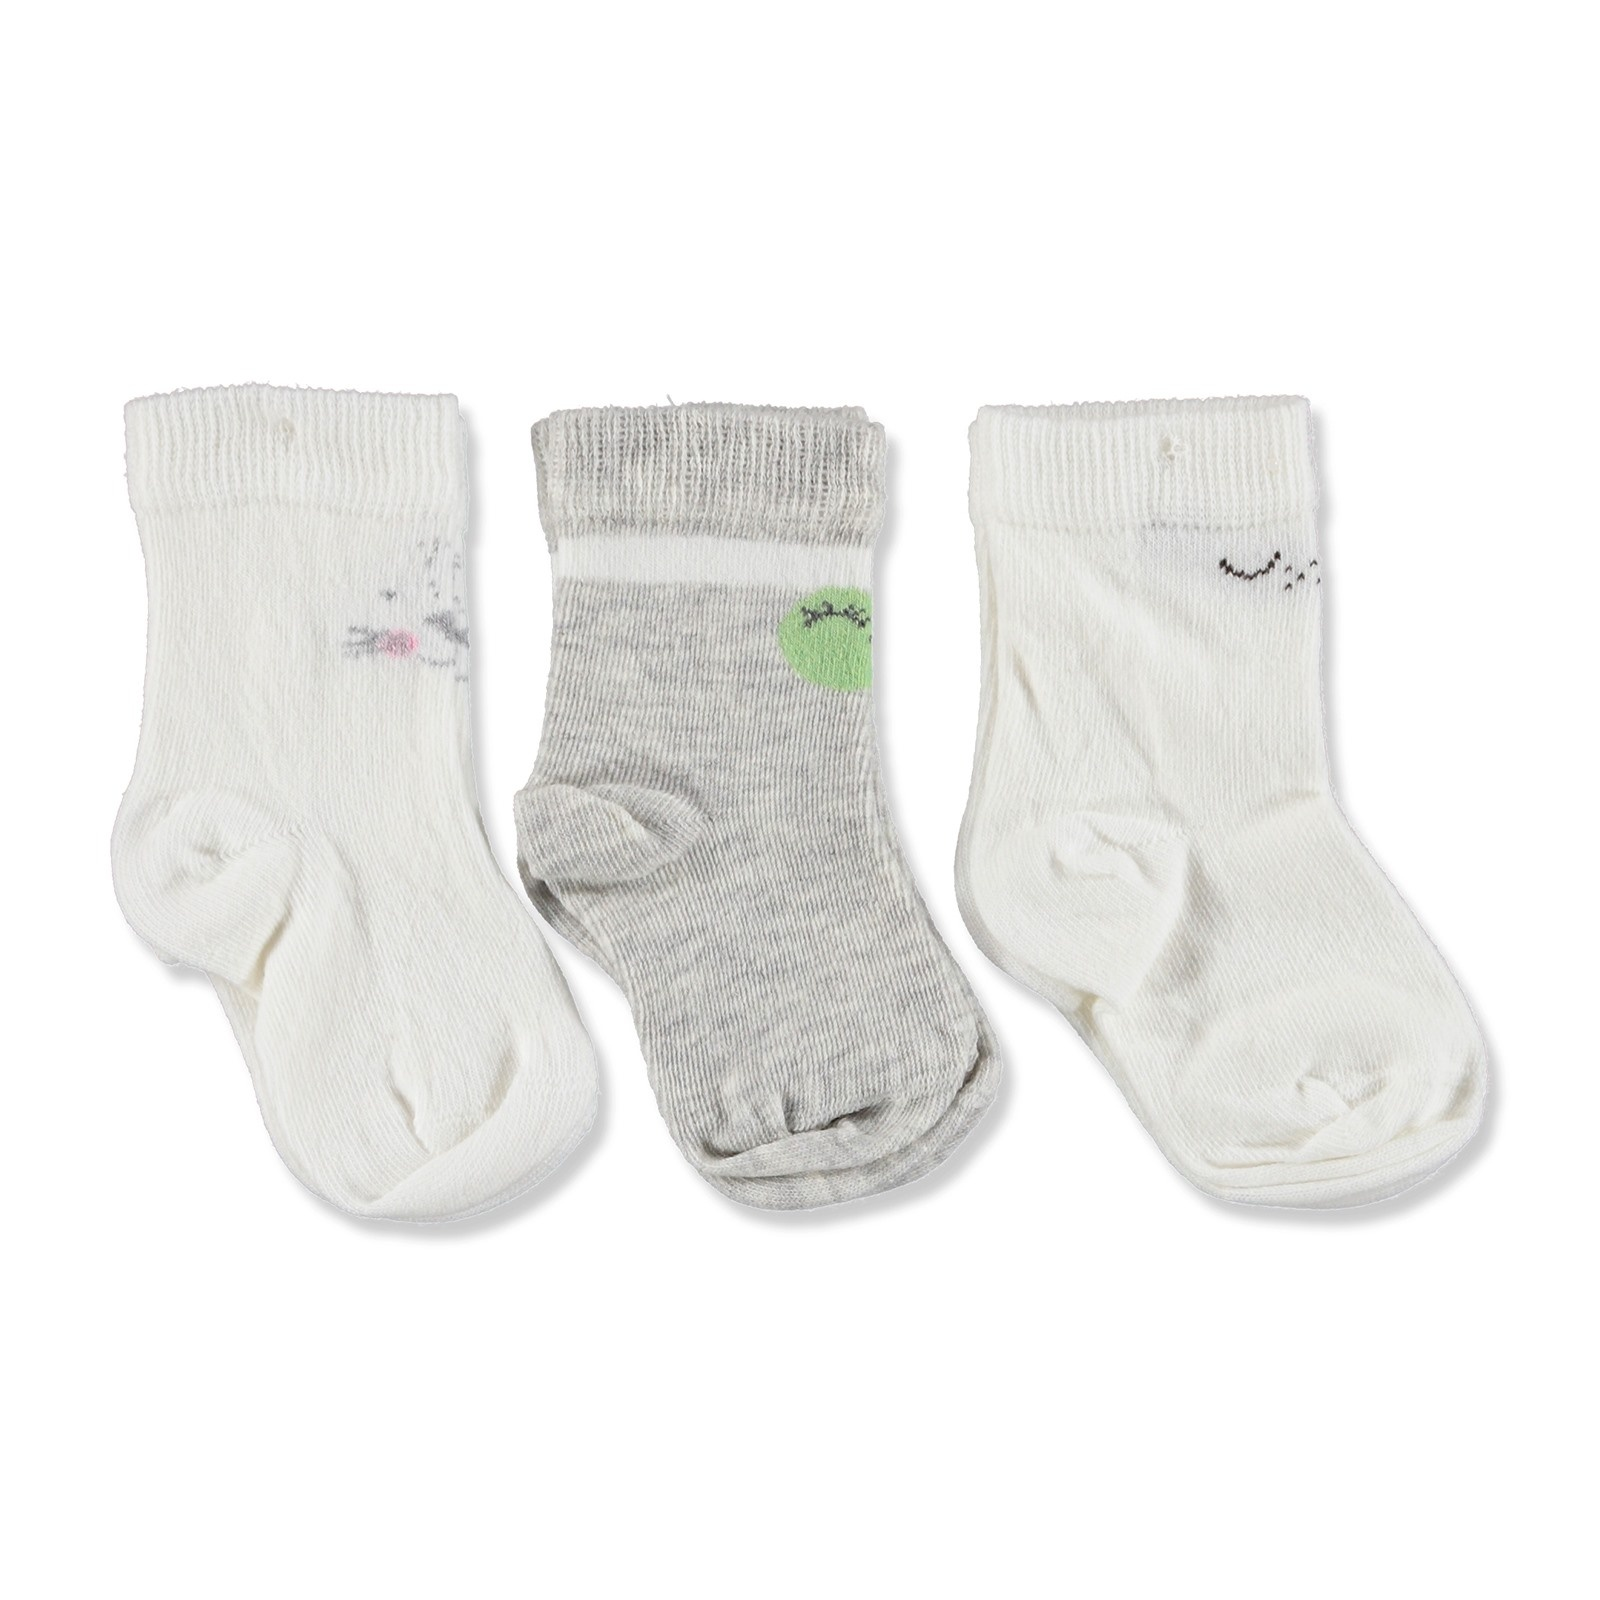 Ebebek Aziz Bebe Baby Socks 3 Pack